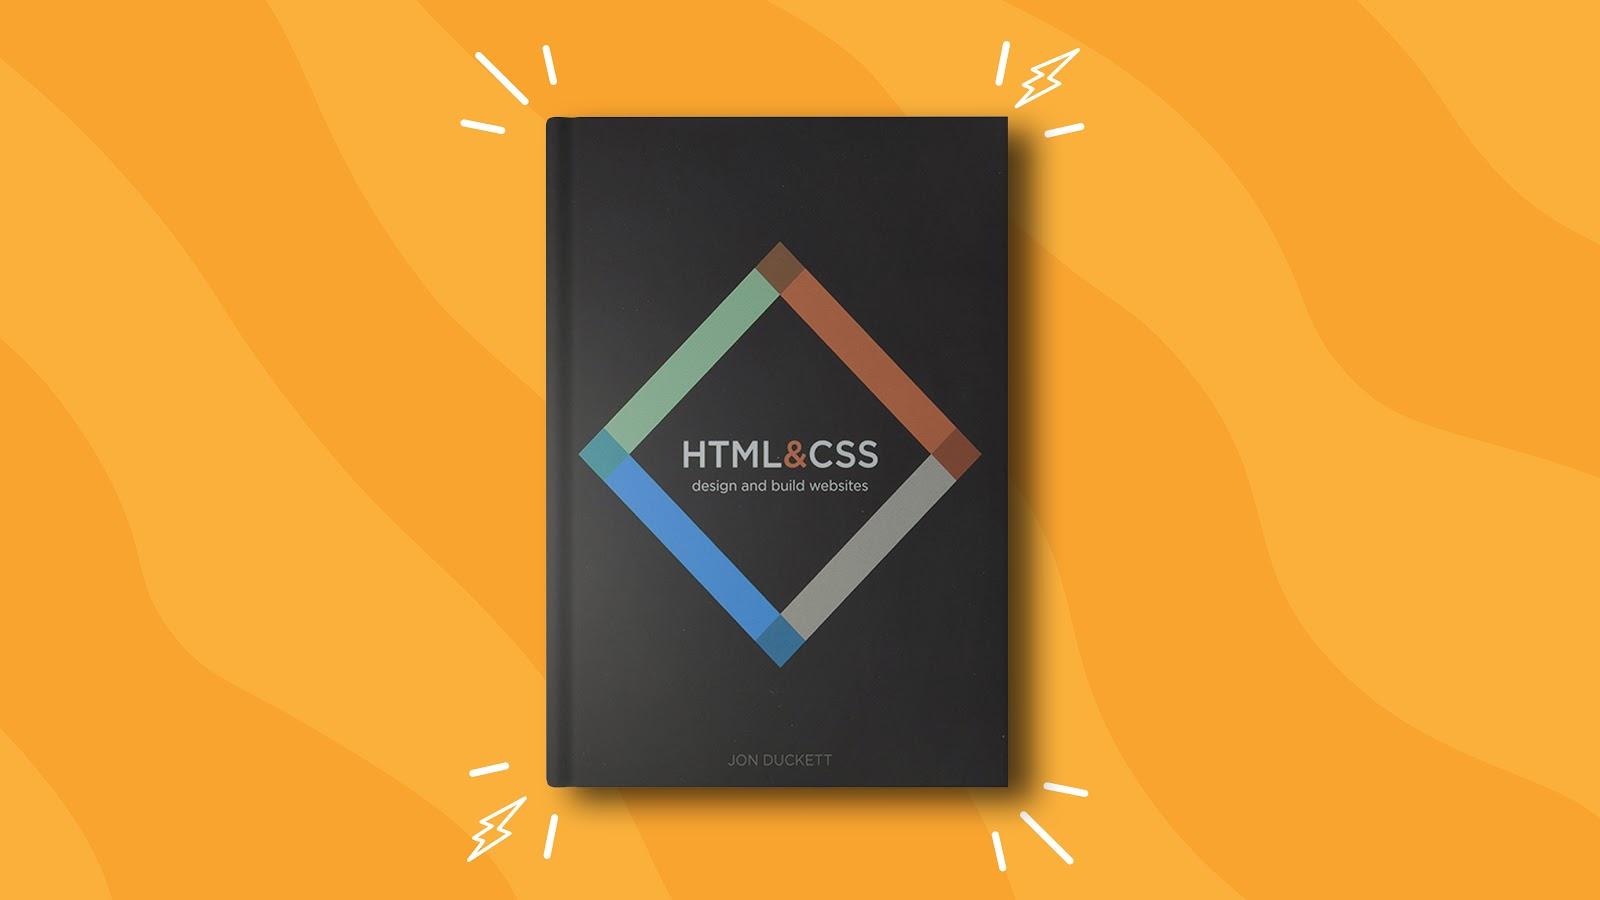 HTML & CSS: Design & Build Websites by Jon Duckett